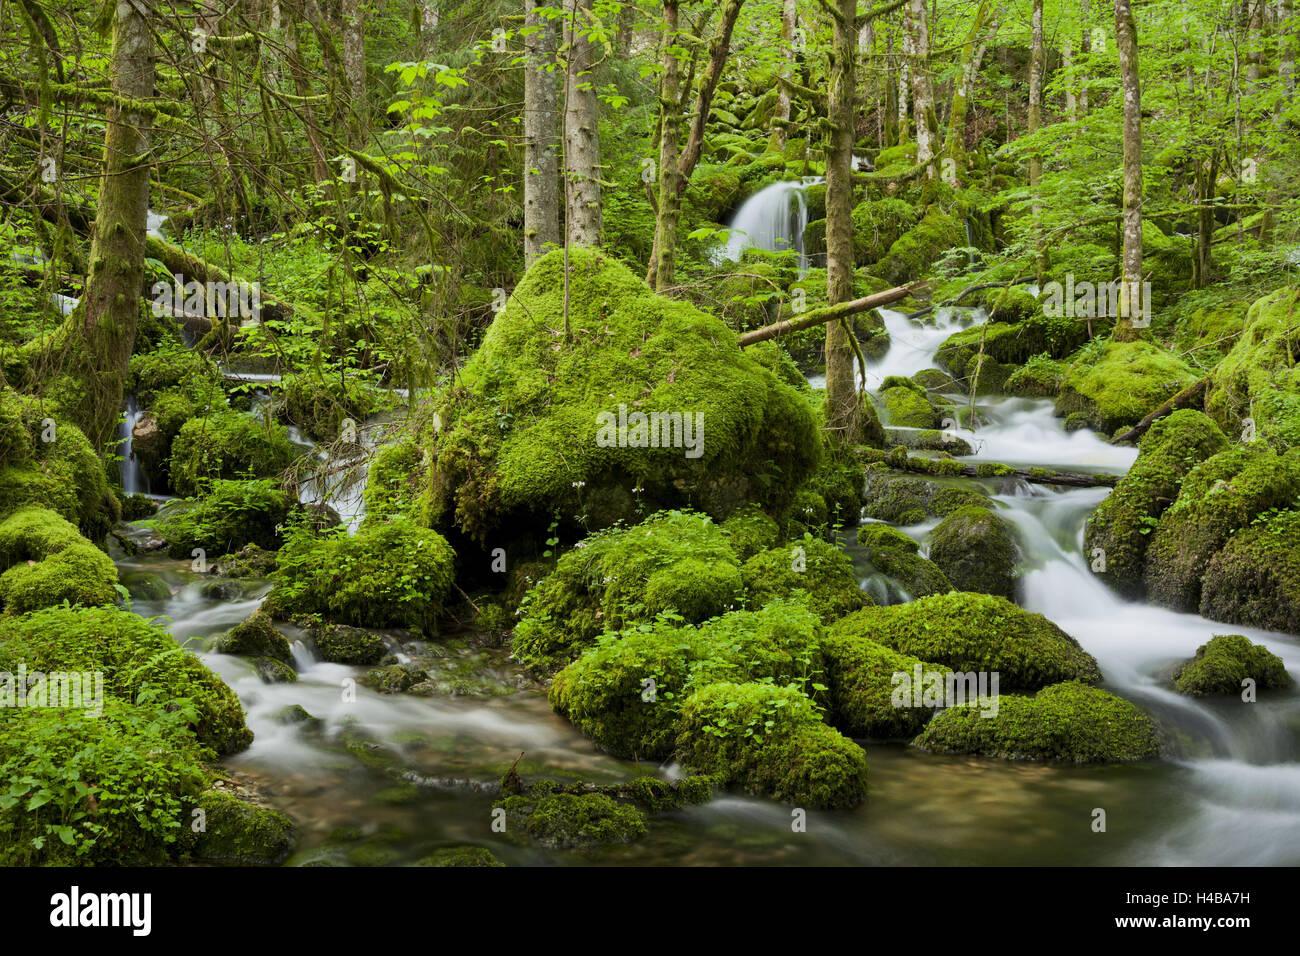 moss-overcast stones, influx of the Orbe, Vallorbe, Vaud, Switzerland - Stock Image